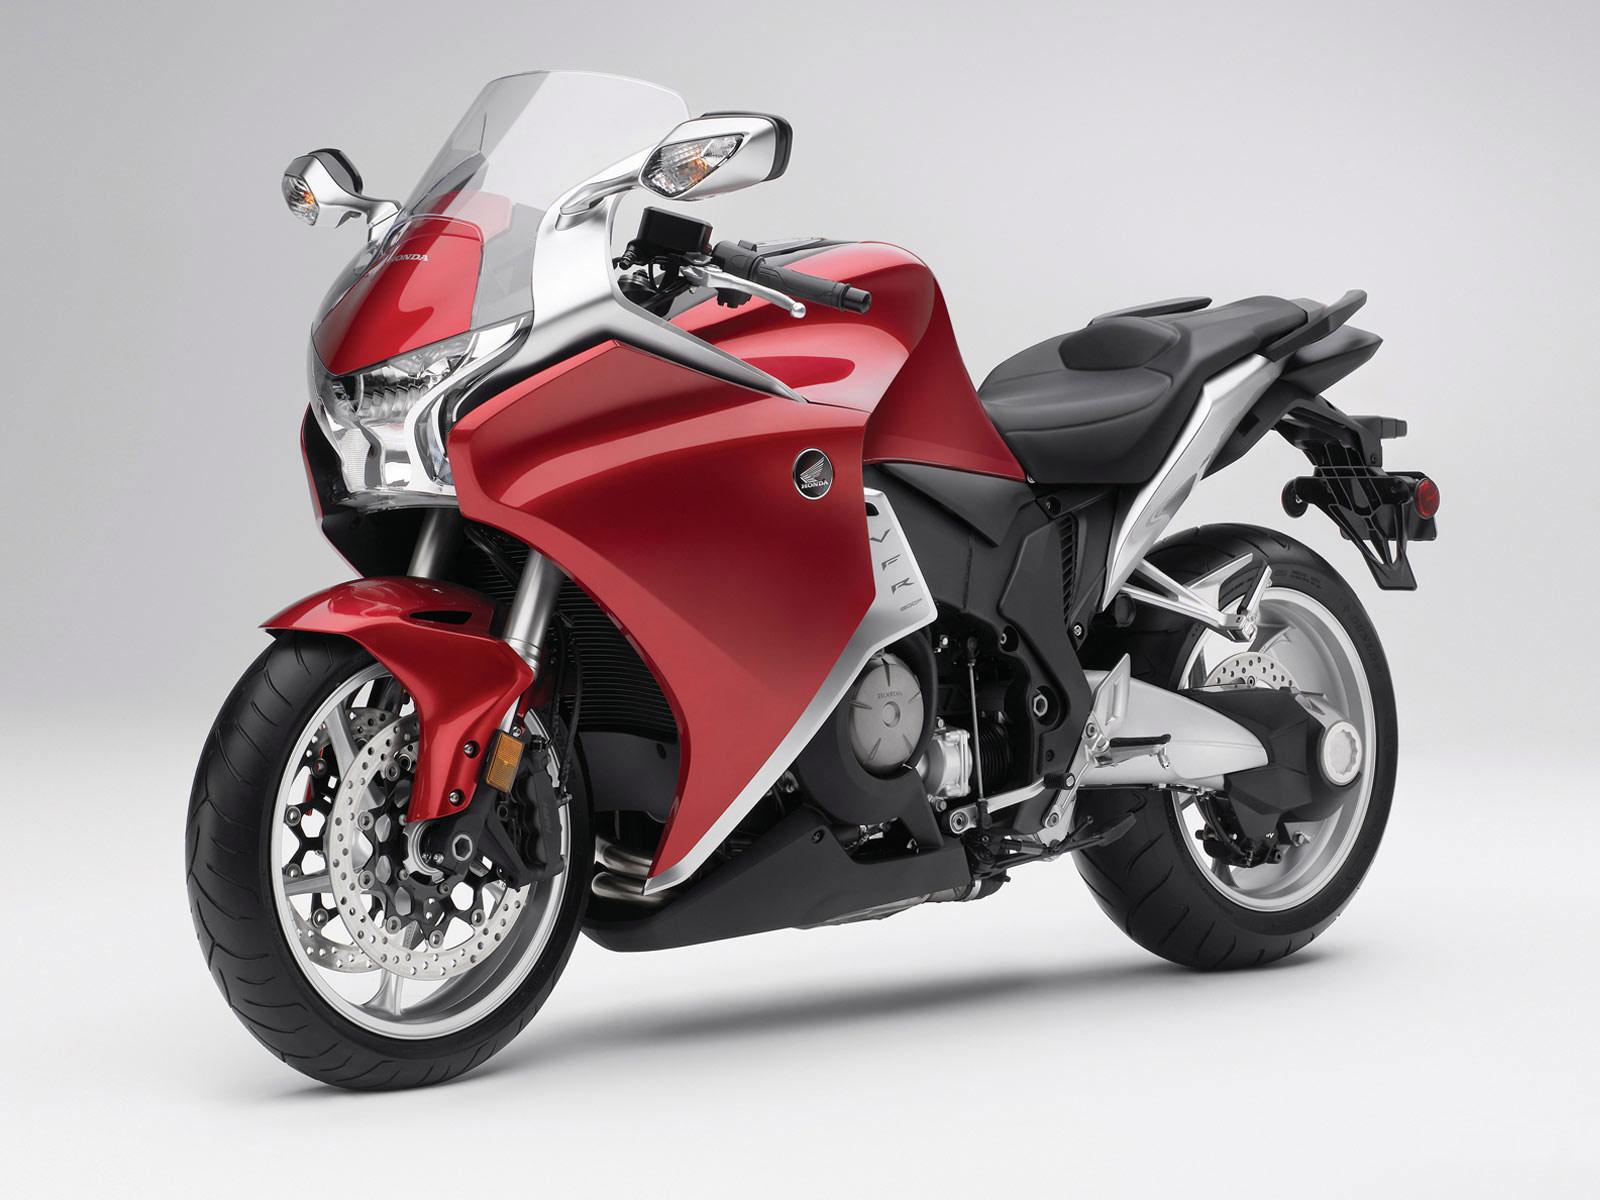 2005 DN-01 Concept Motorcycle wallpaper, insurance info